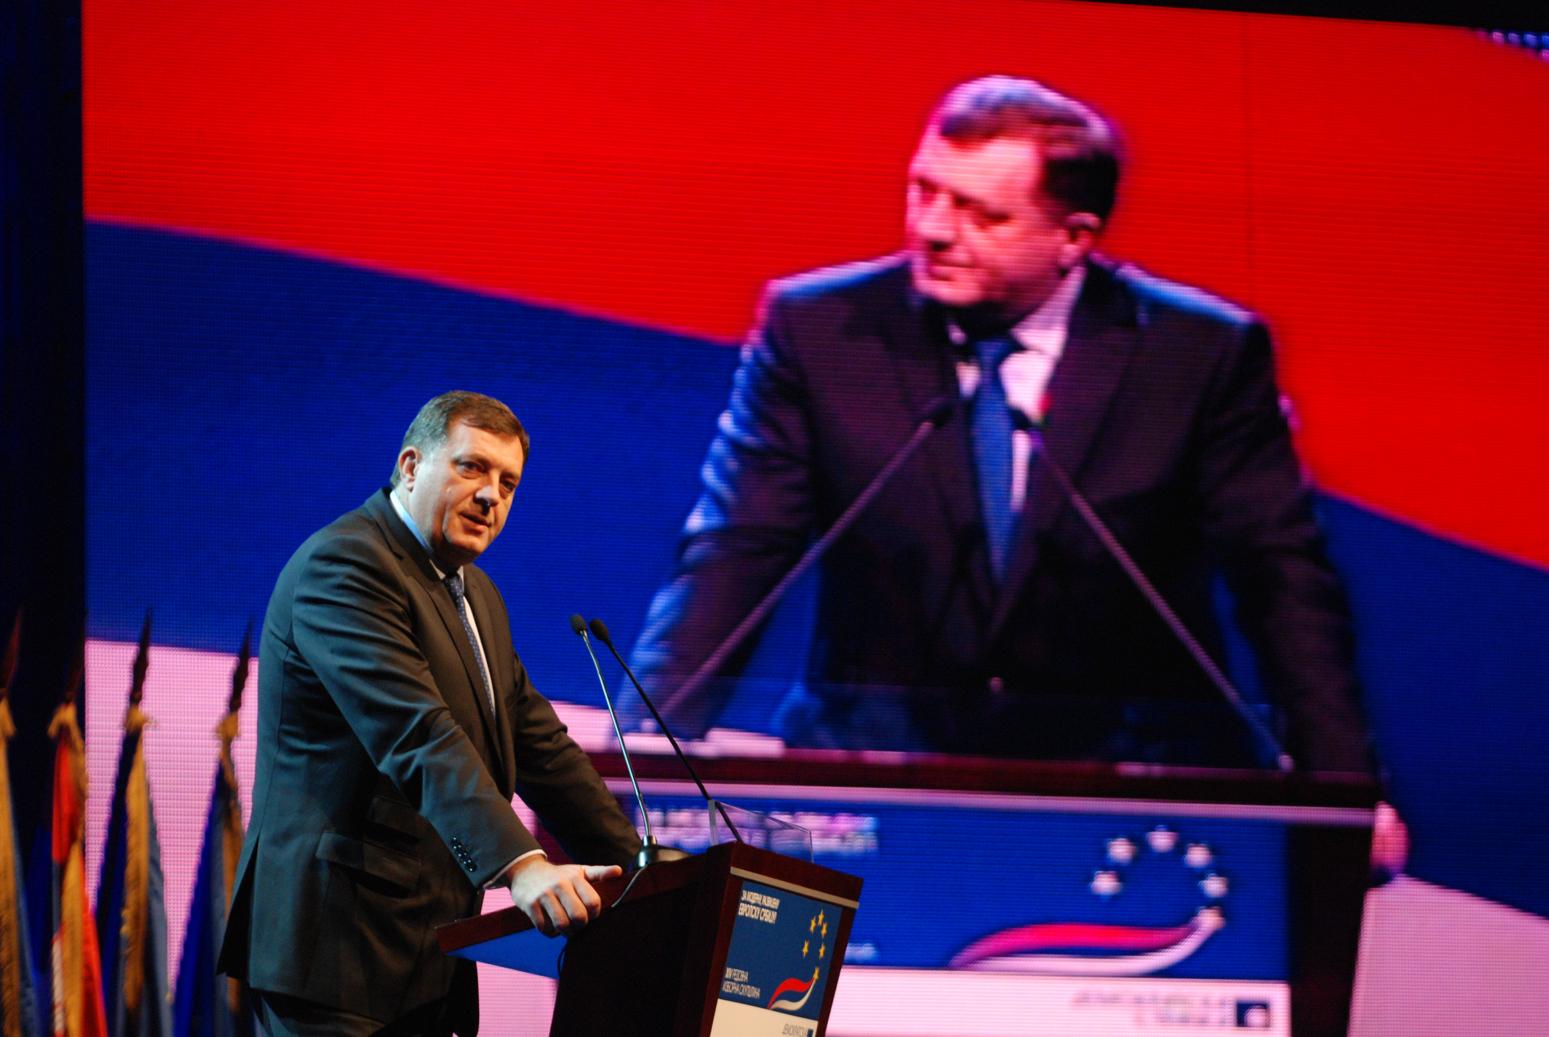 Prezident Republiky srbské Milorad Dodik. (Zdroj: Wikimedia Commons)